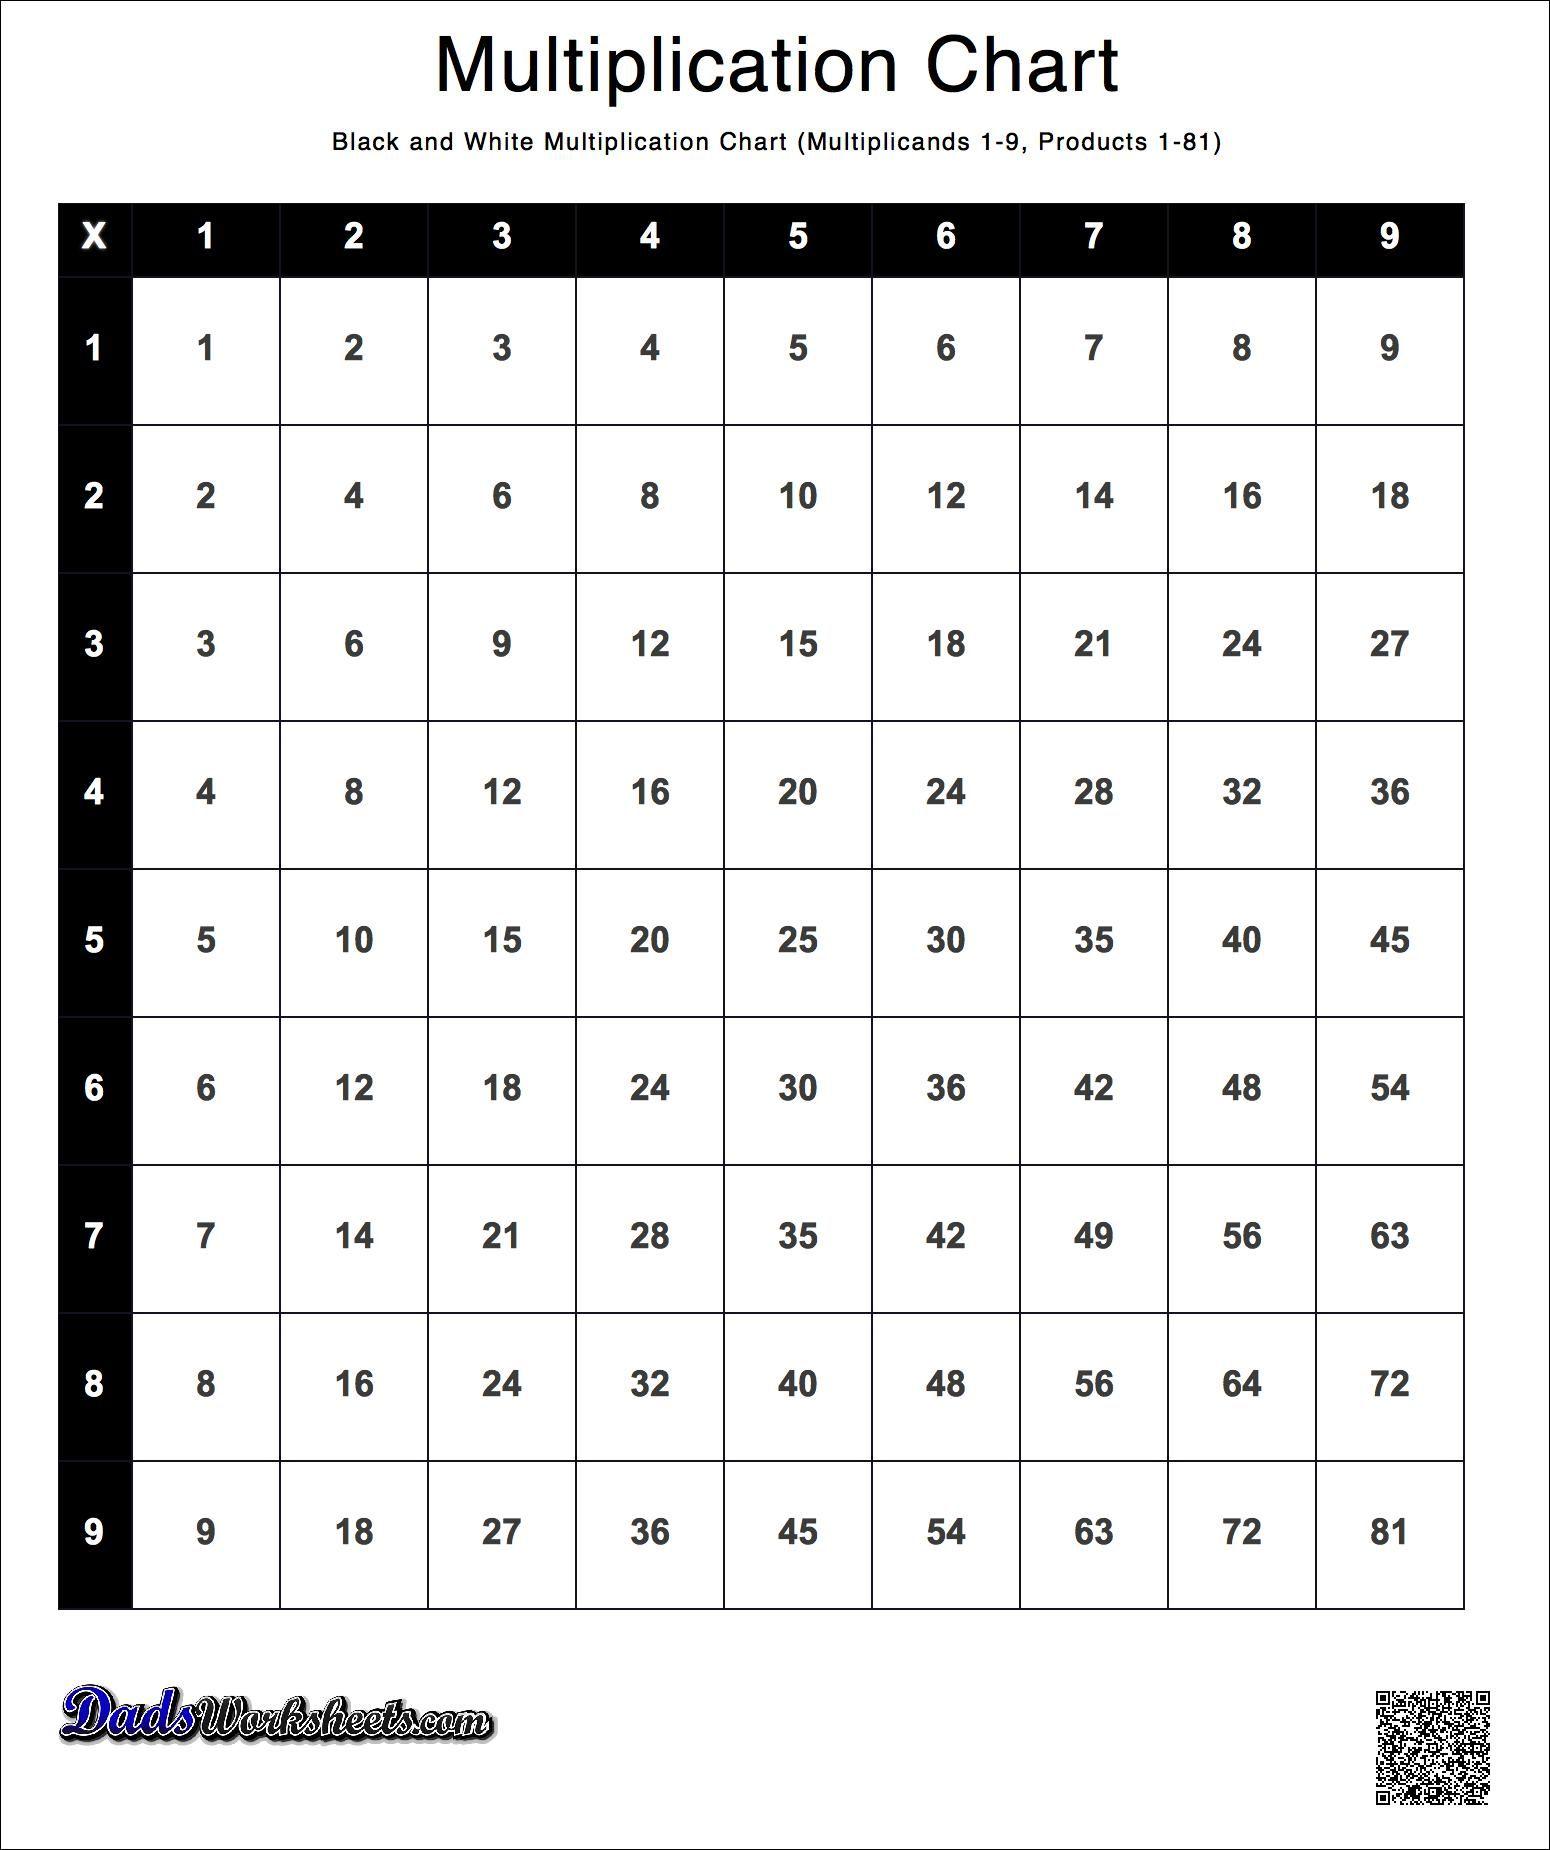 Multiplication Chart Black And White Multiplication Chart